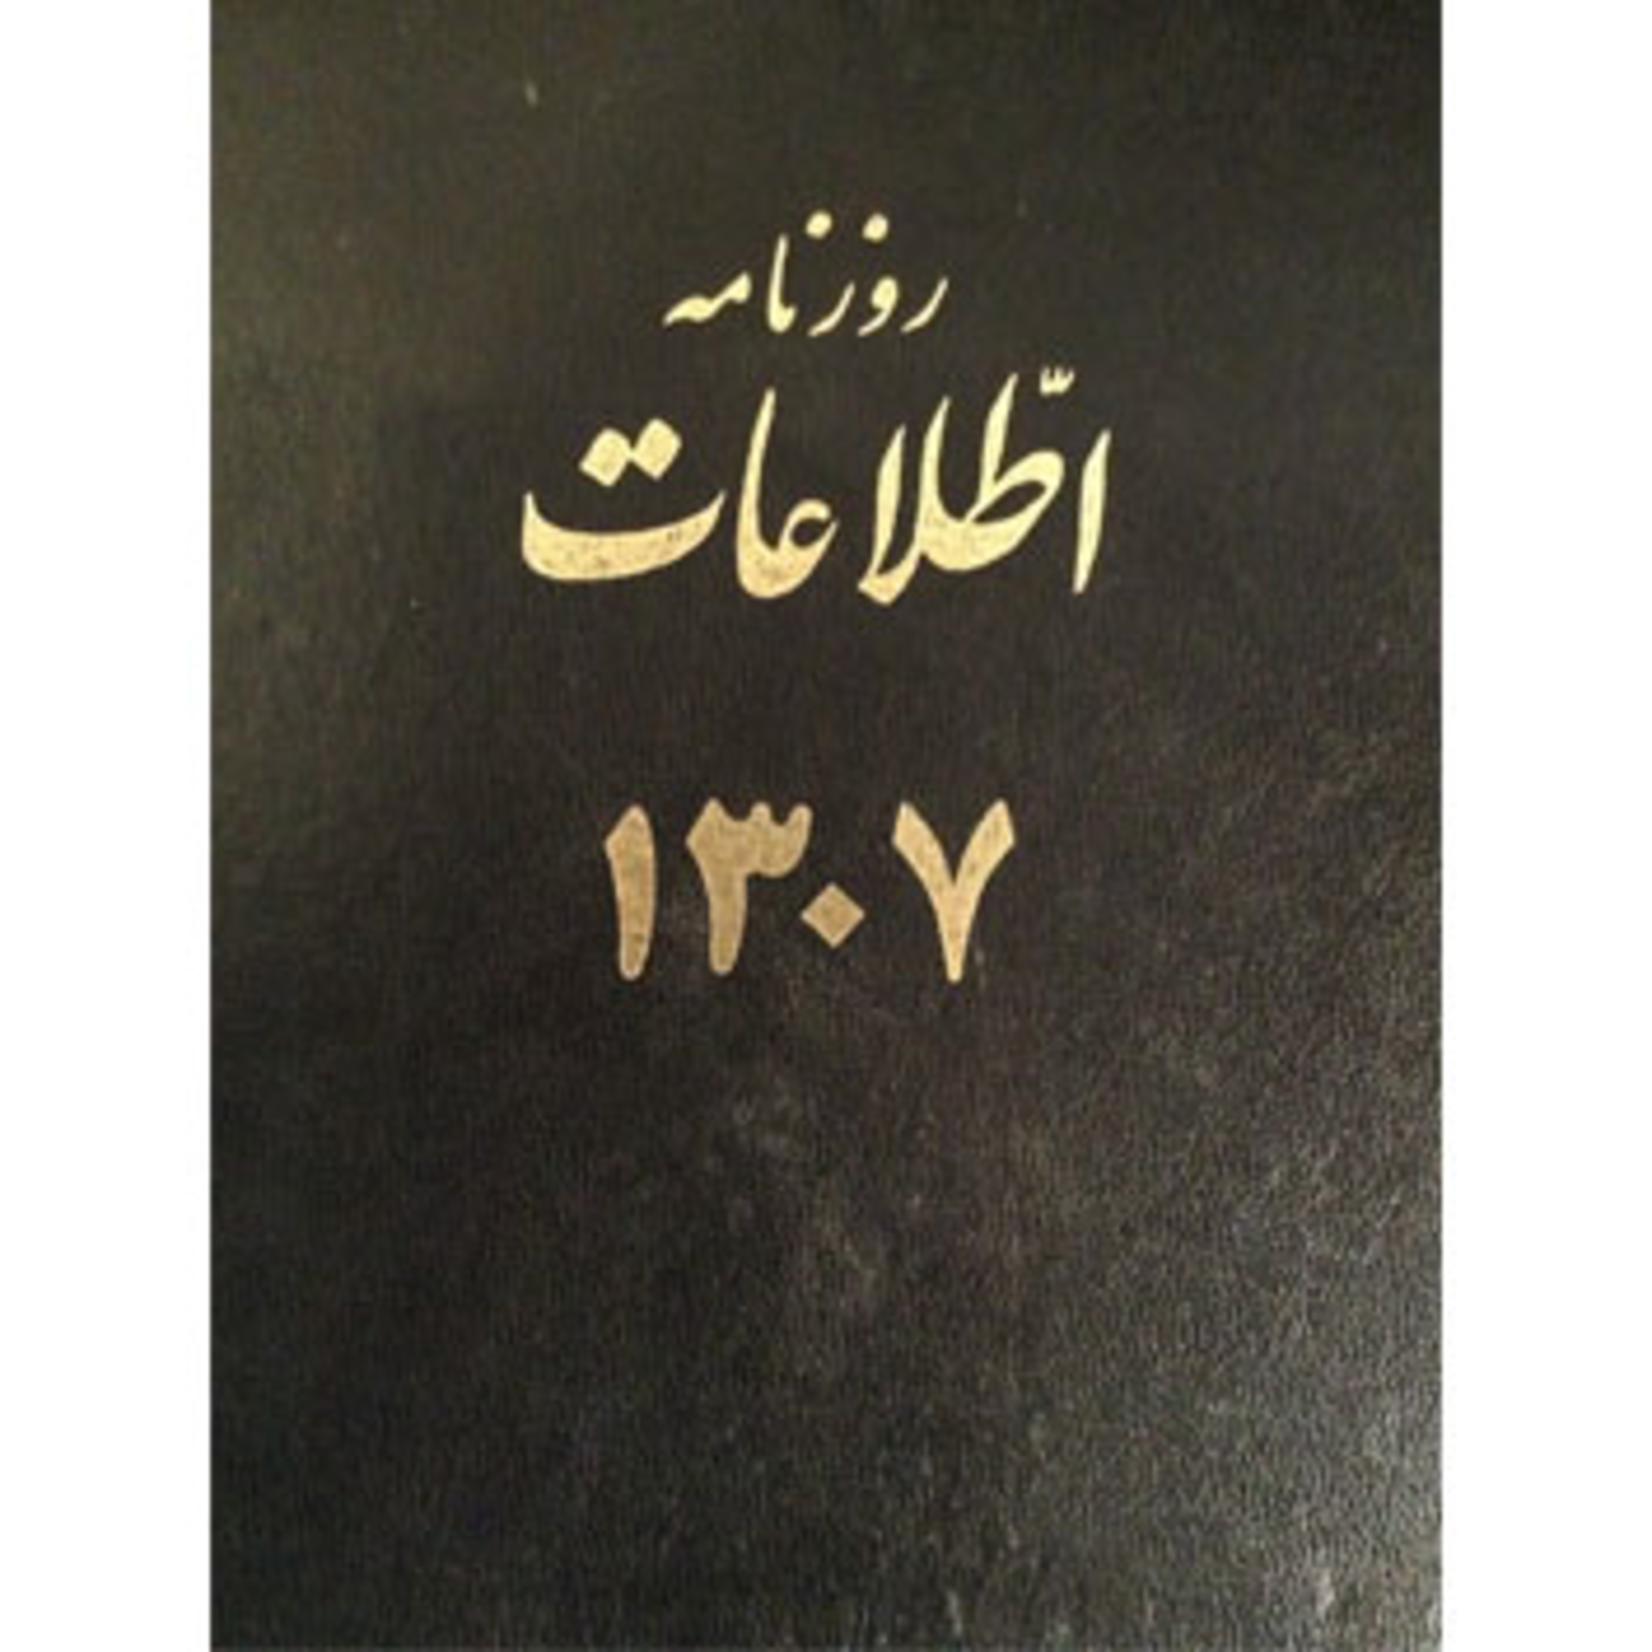 TAJHOME Ettelaat Book